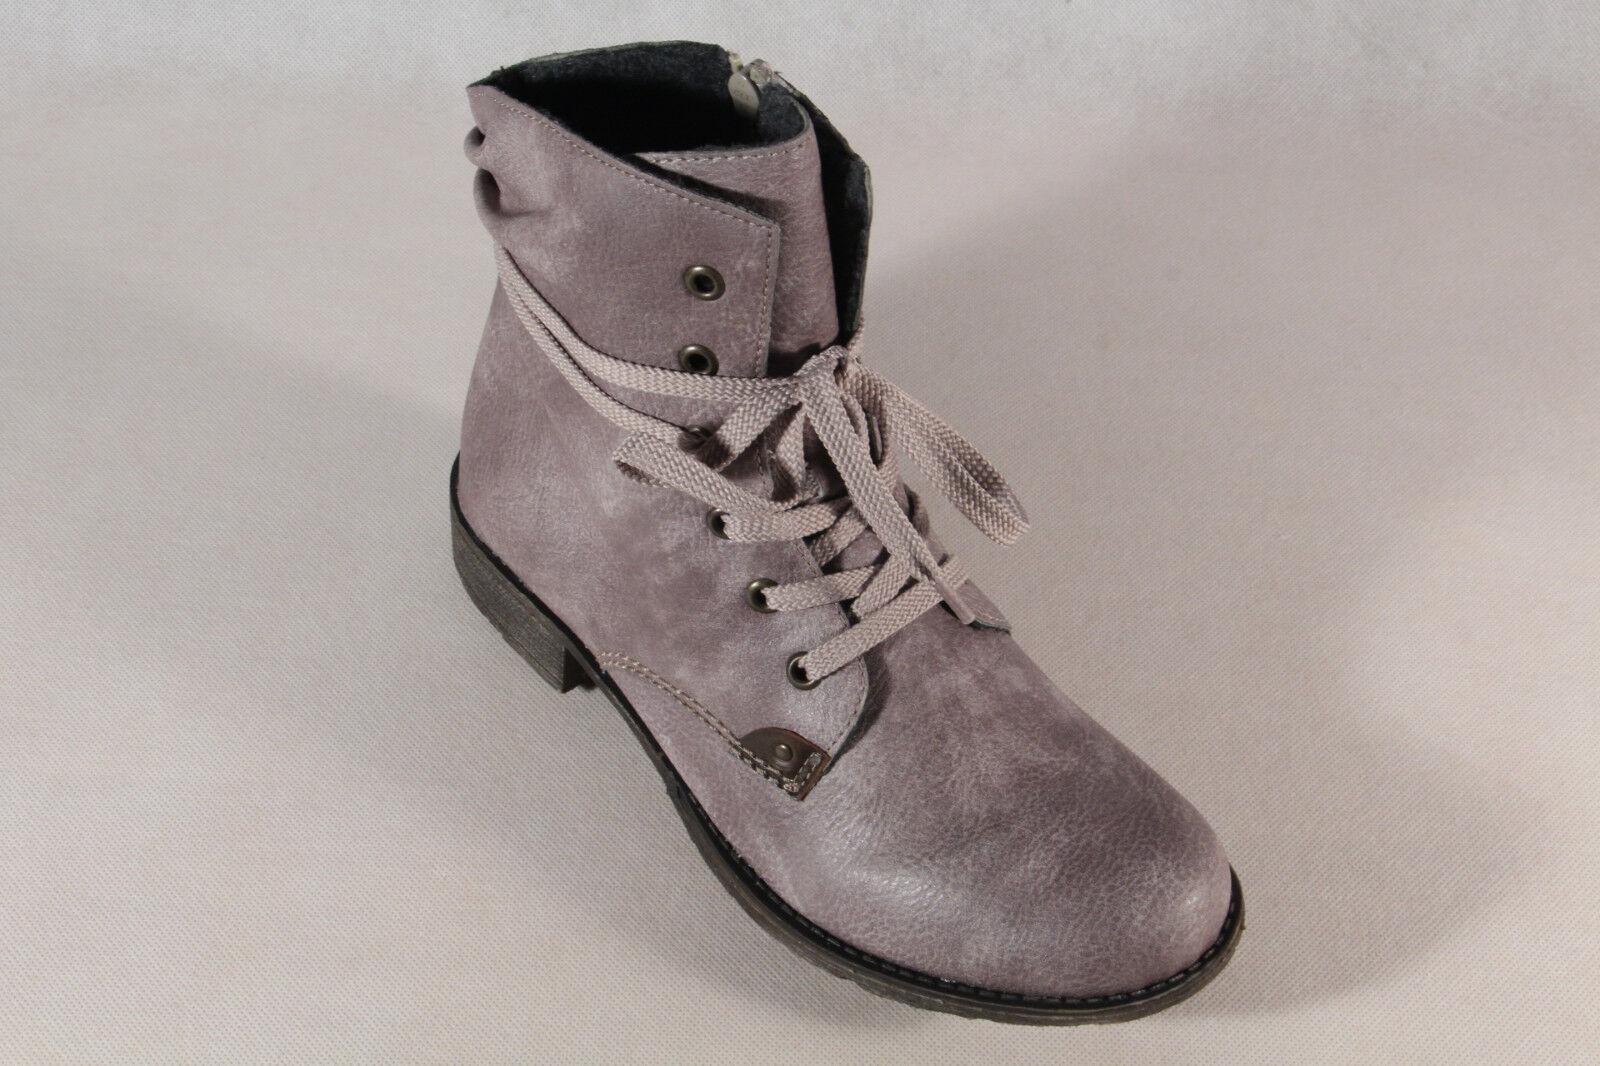 Rieker botas botas Mujer Botines botas botas de Cordón botas gris 70829 Nuevo d6da3f